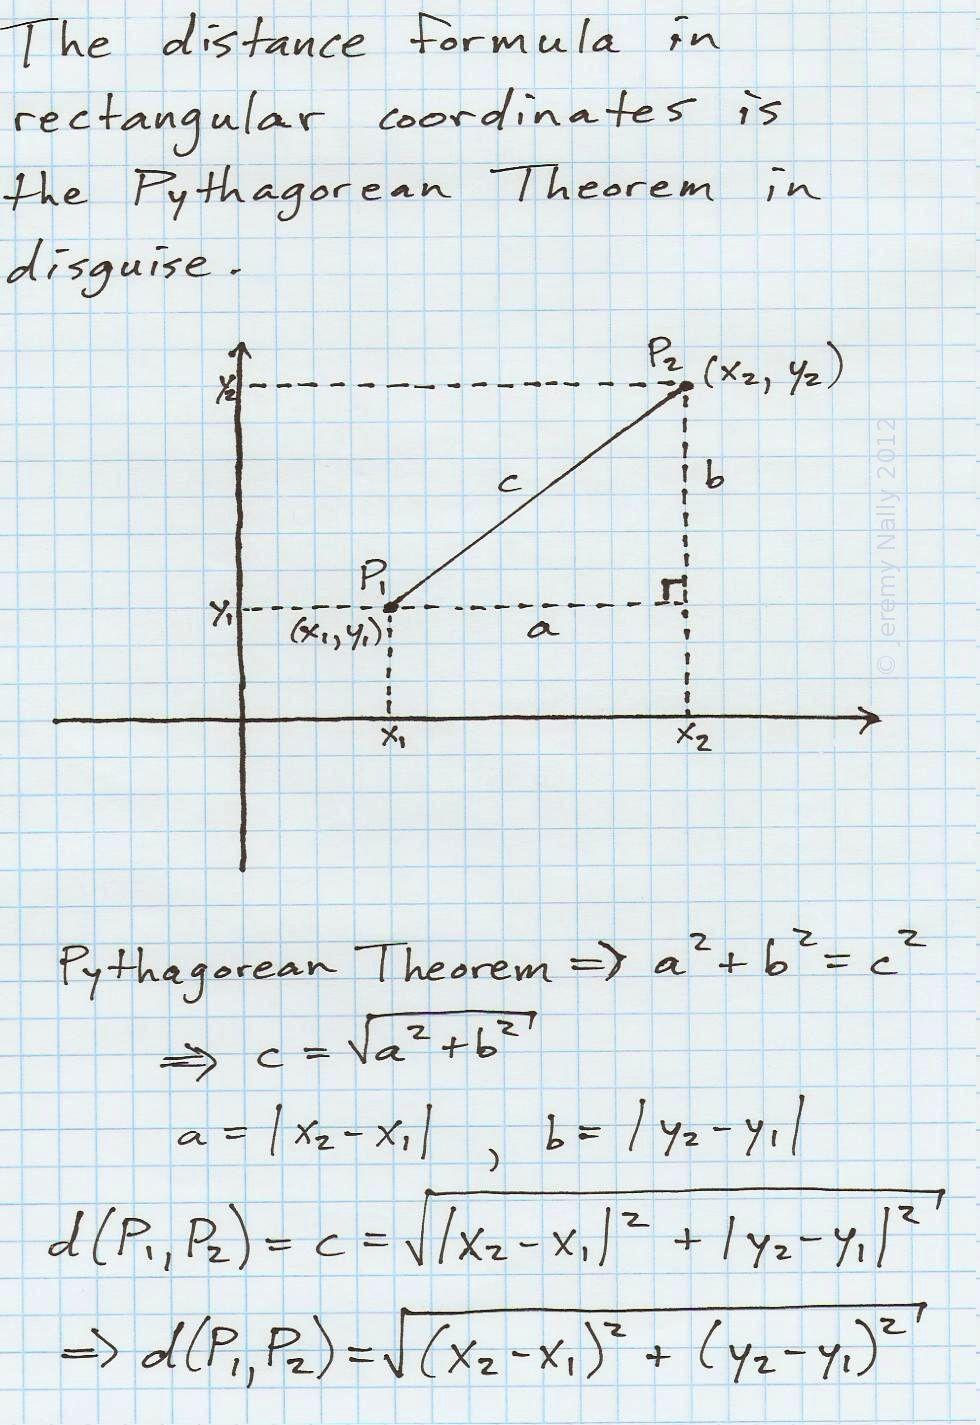 The Distance formula Worksheet Answers the Distance formula In Rectangular Cartesian Coordinates